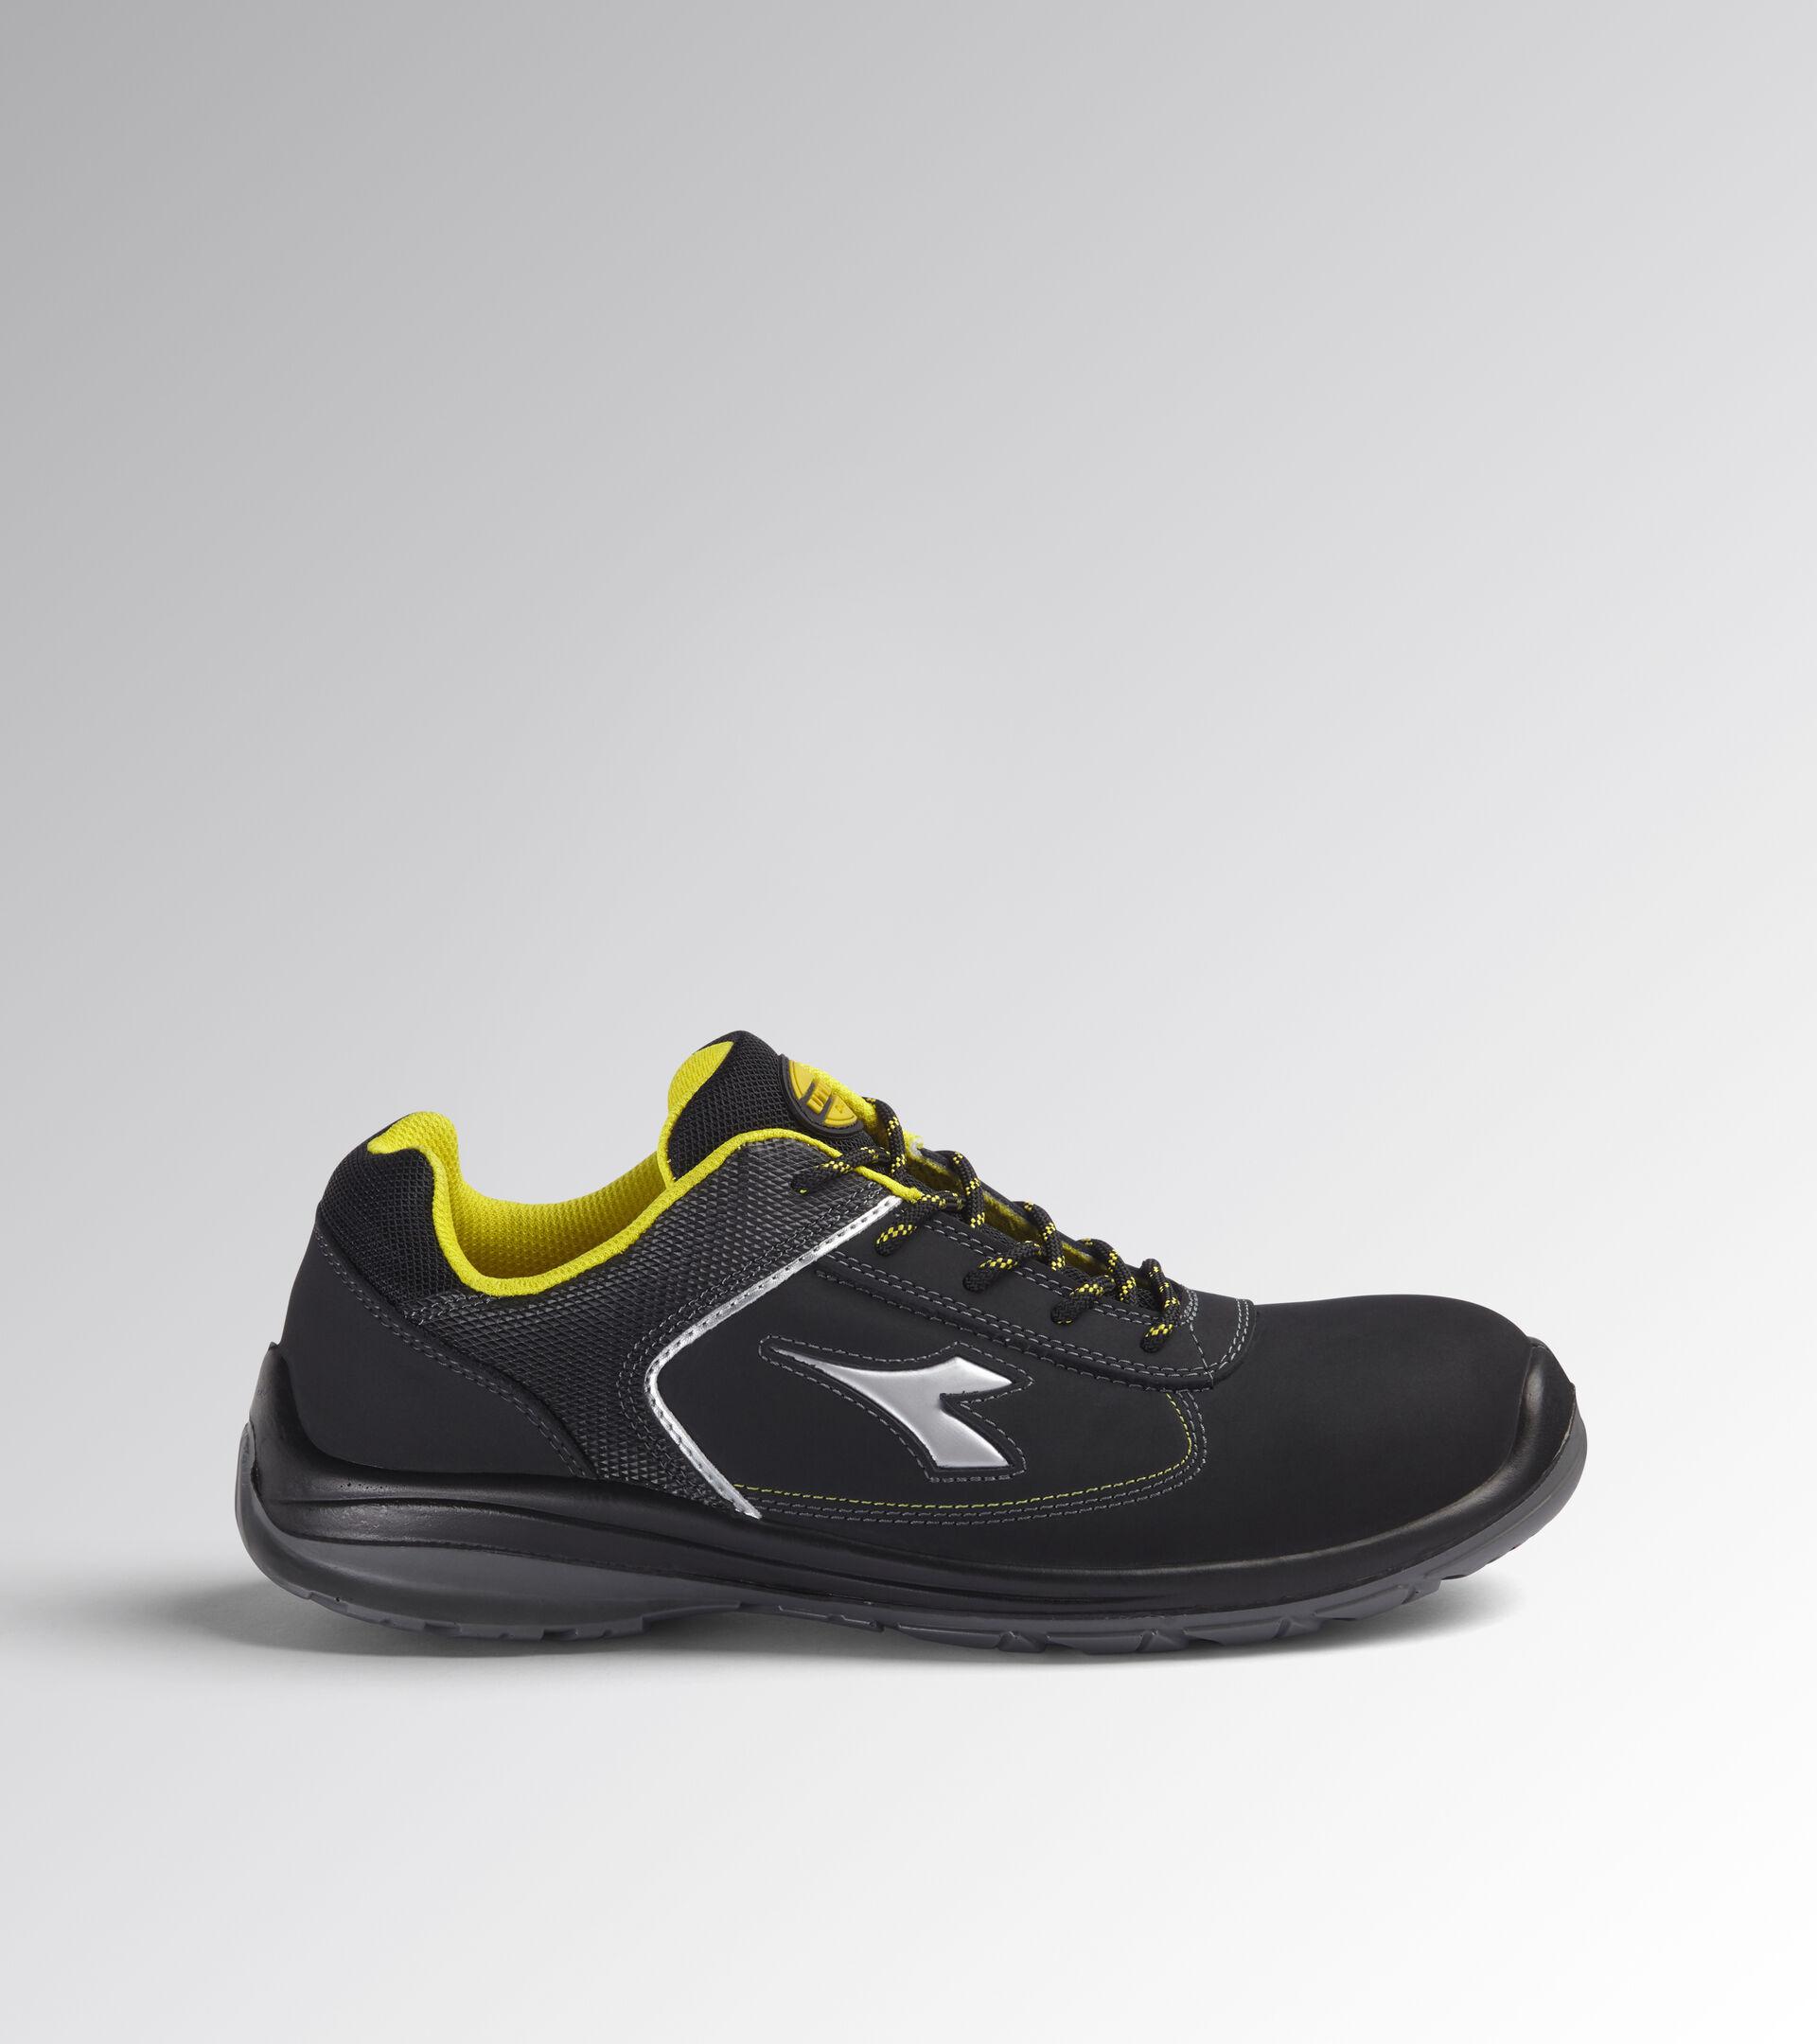 Footwear Utility UNISEX BLITZ LOW S3 SRC SCHWARZ Utility